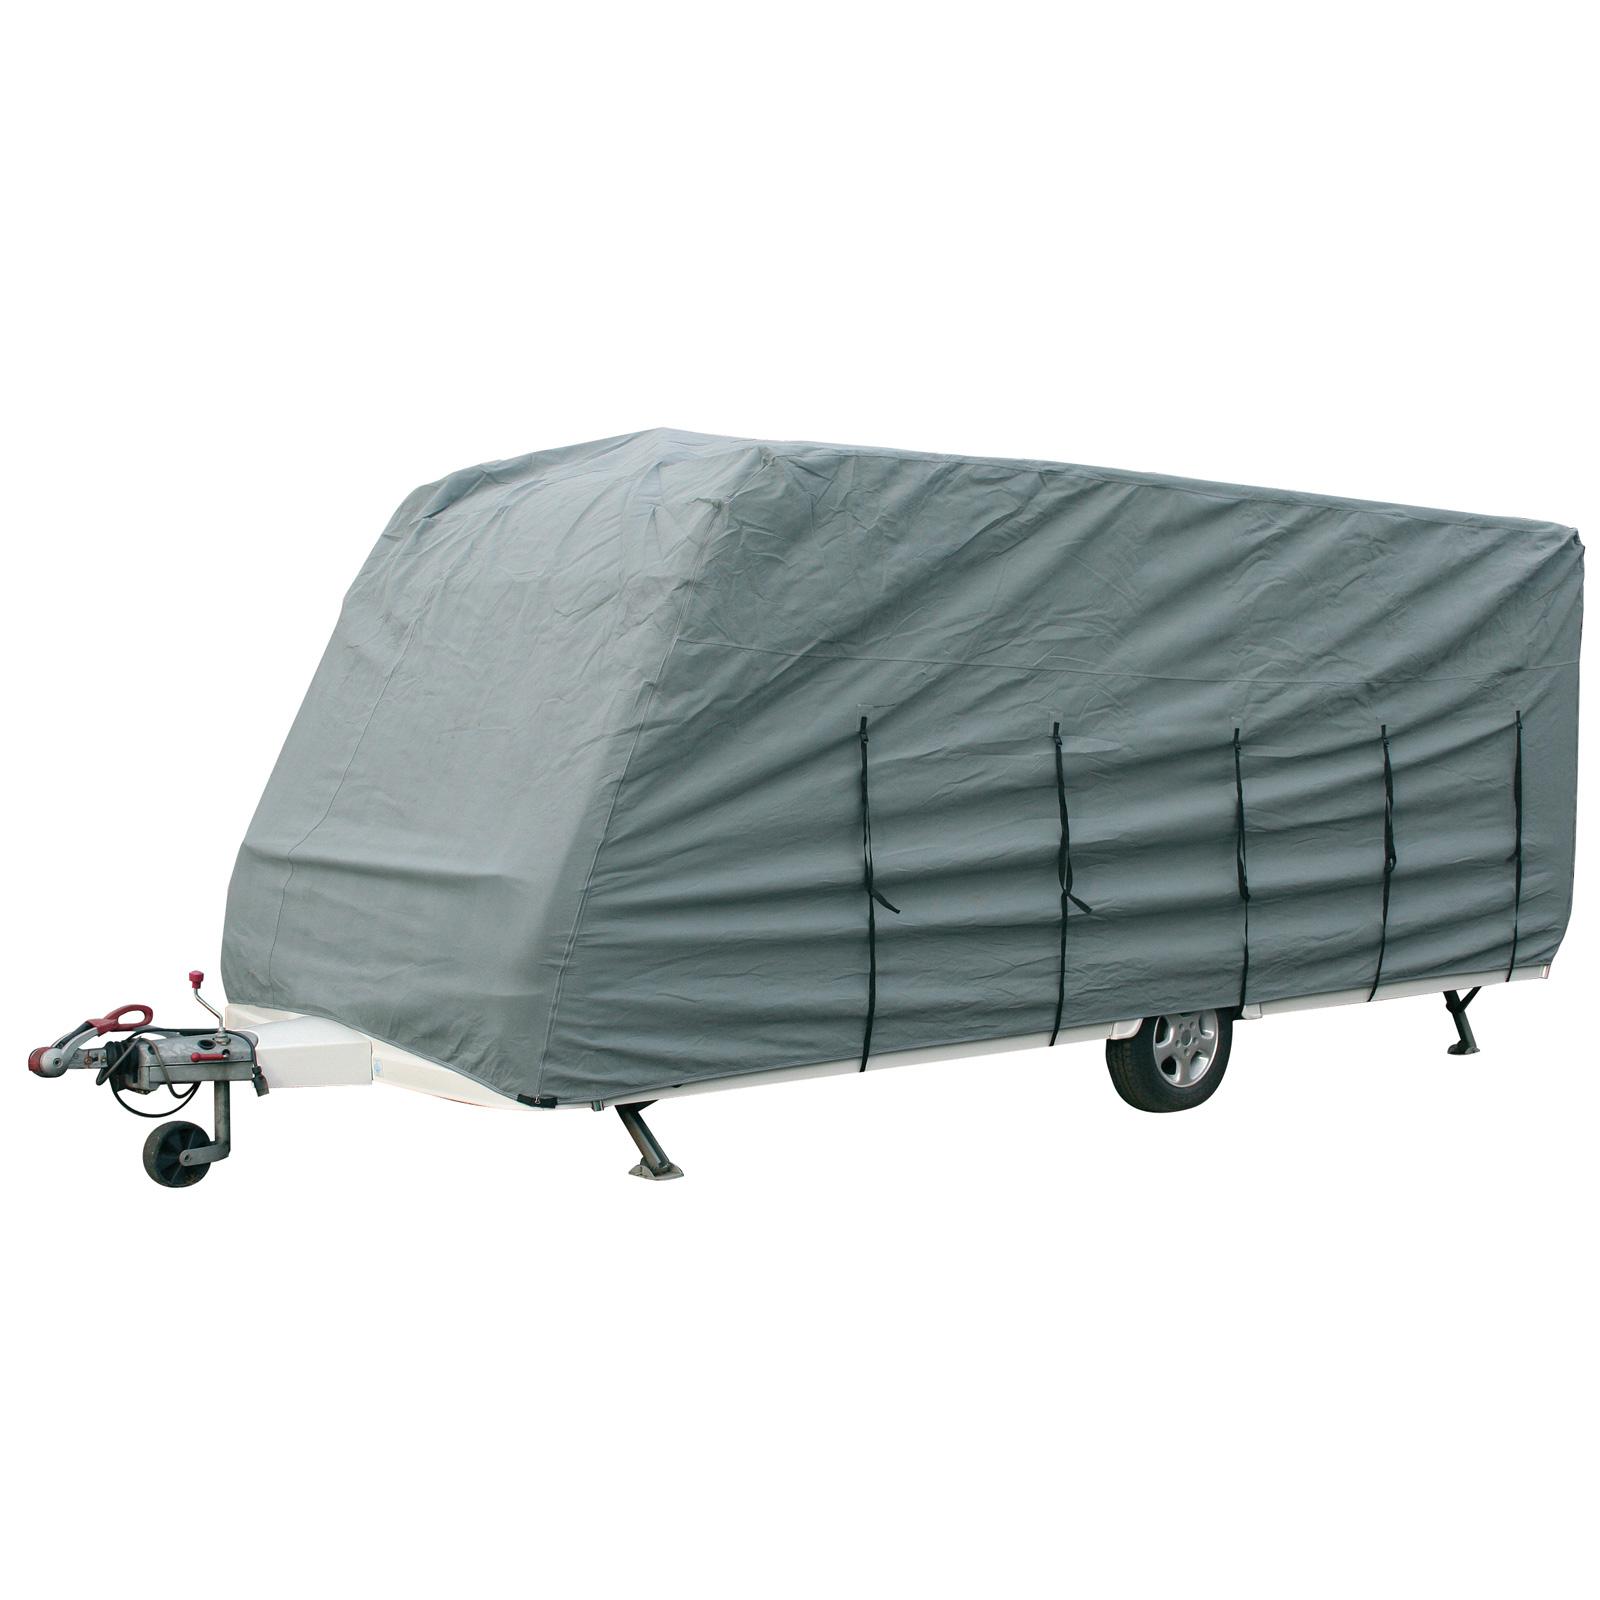 falt wohnwagen abdeckung 7 0 7 5m schutzh lle cover. Black Bedroom Furniture Sets. Home Design Ideas